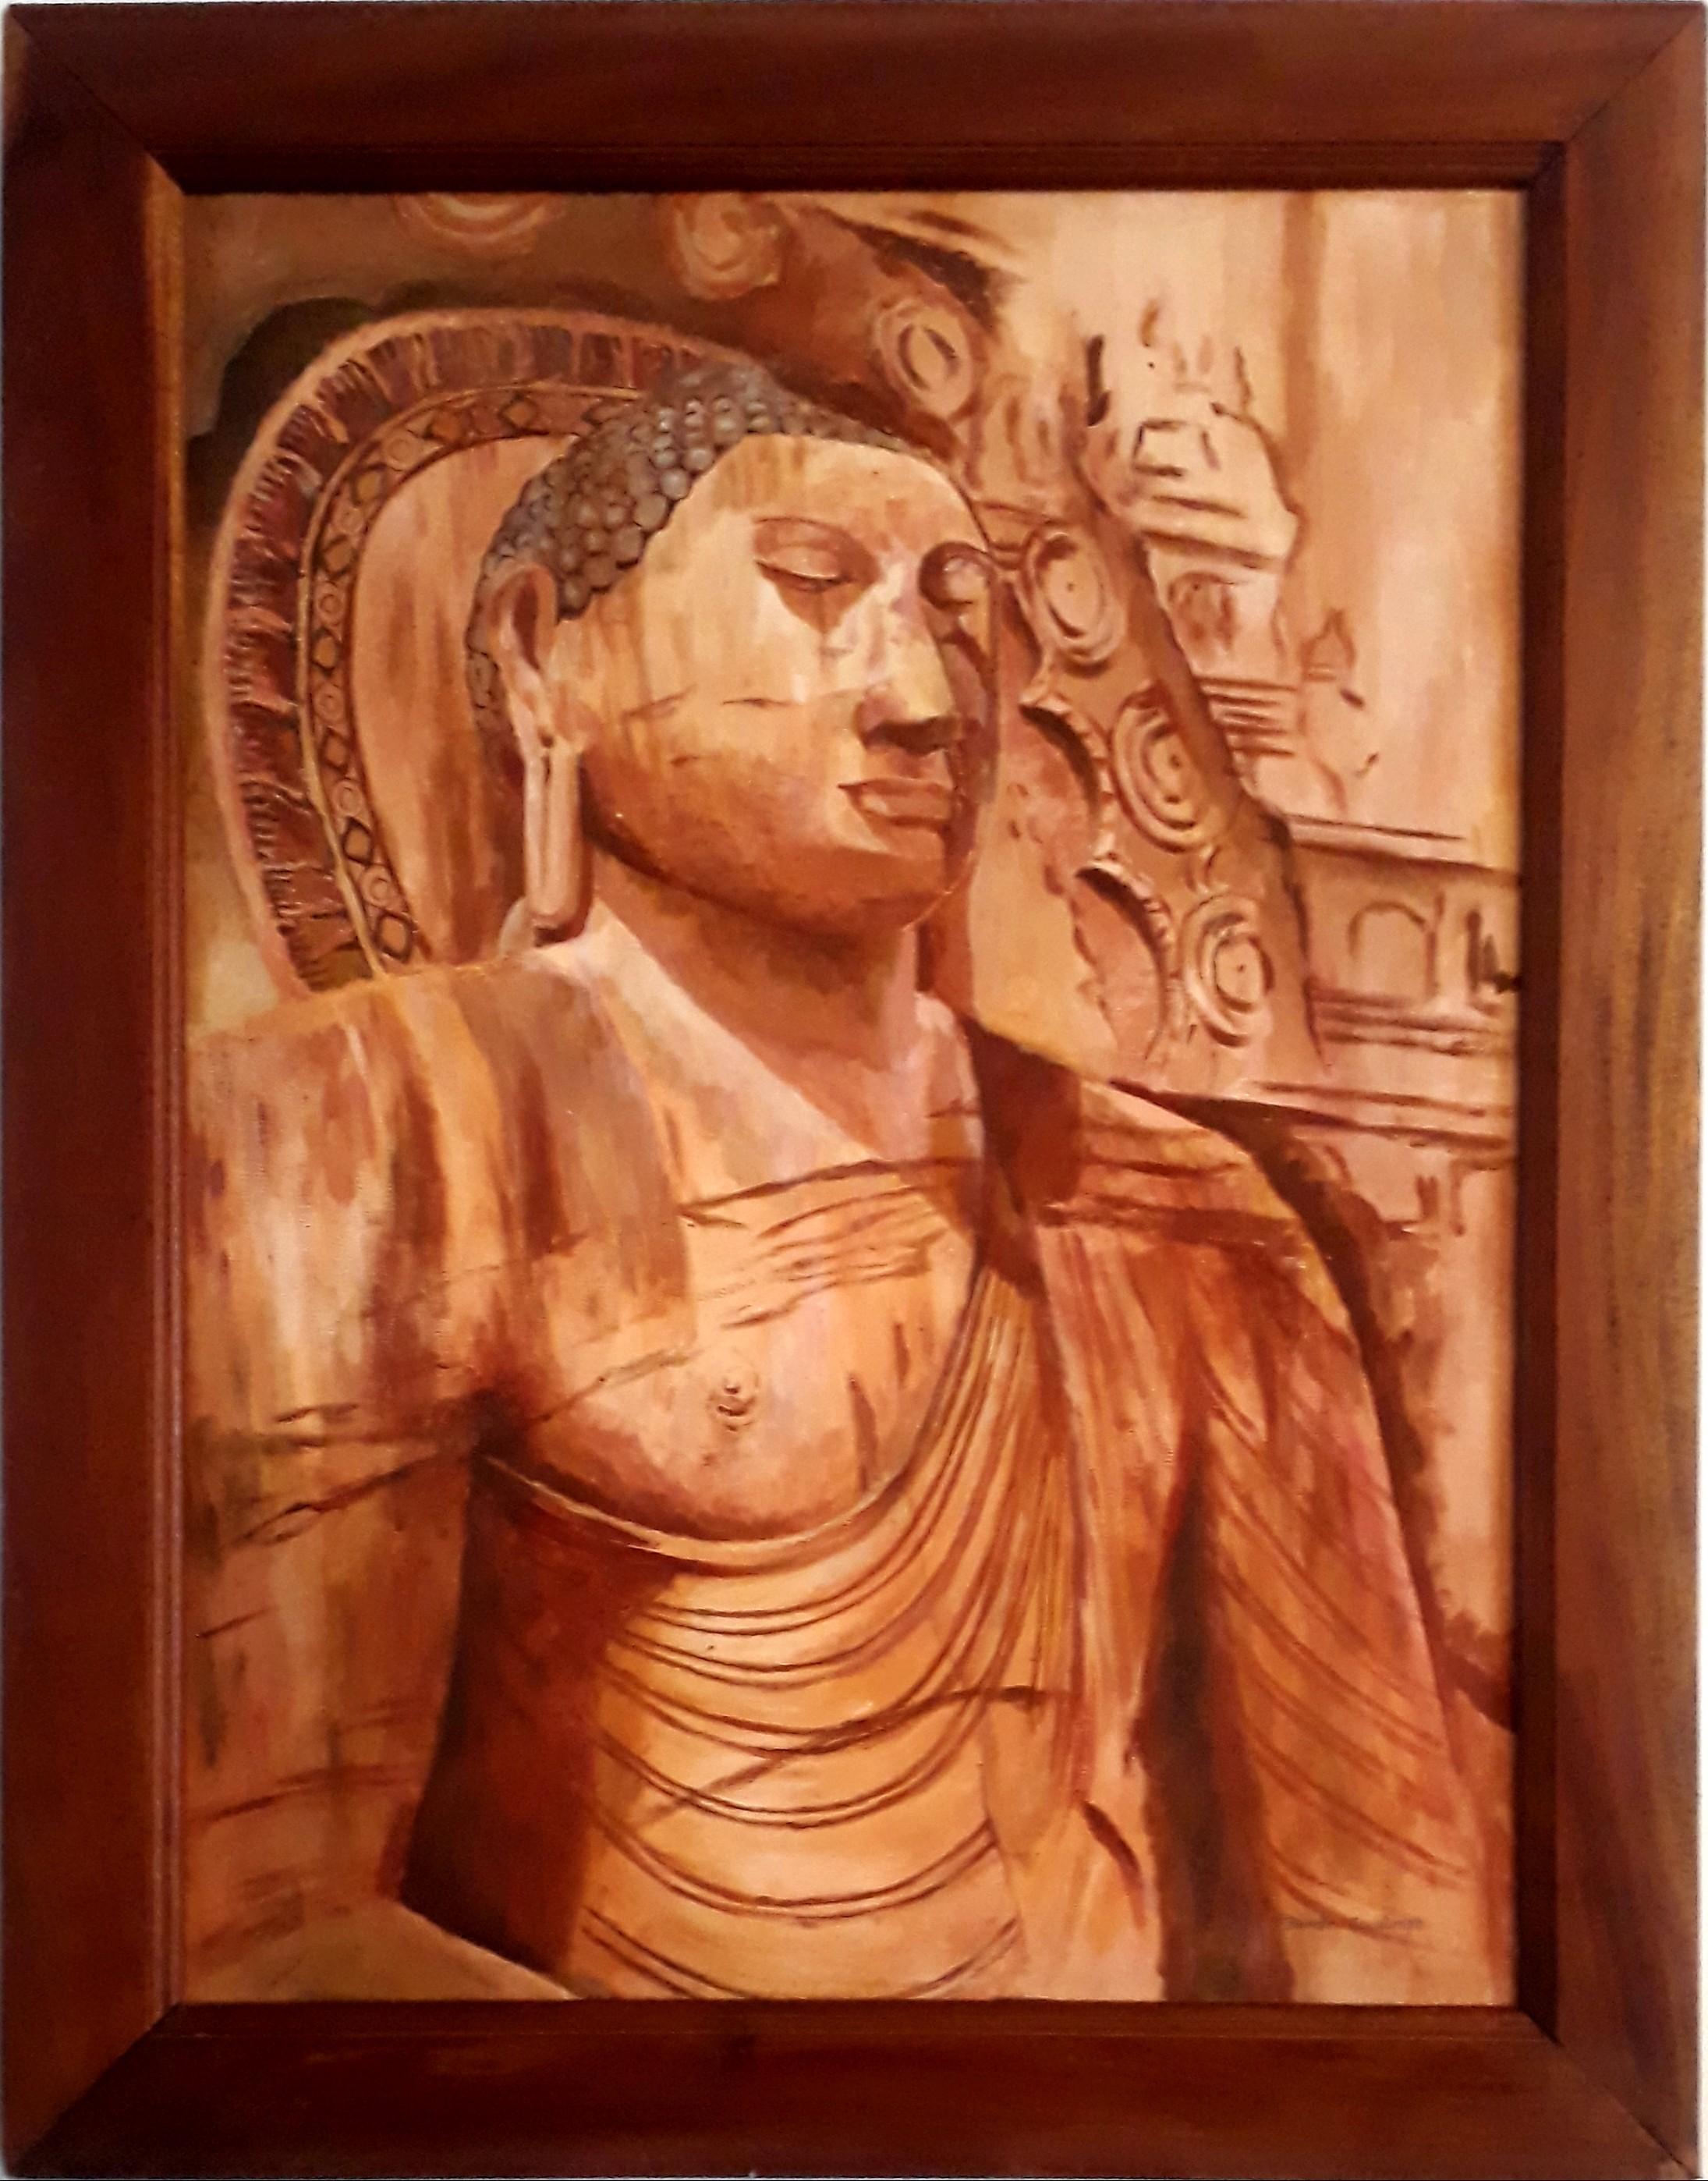 Gal vihara Buddha by Brindley Jayatunga